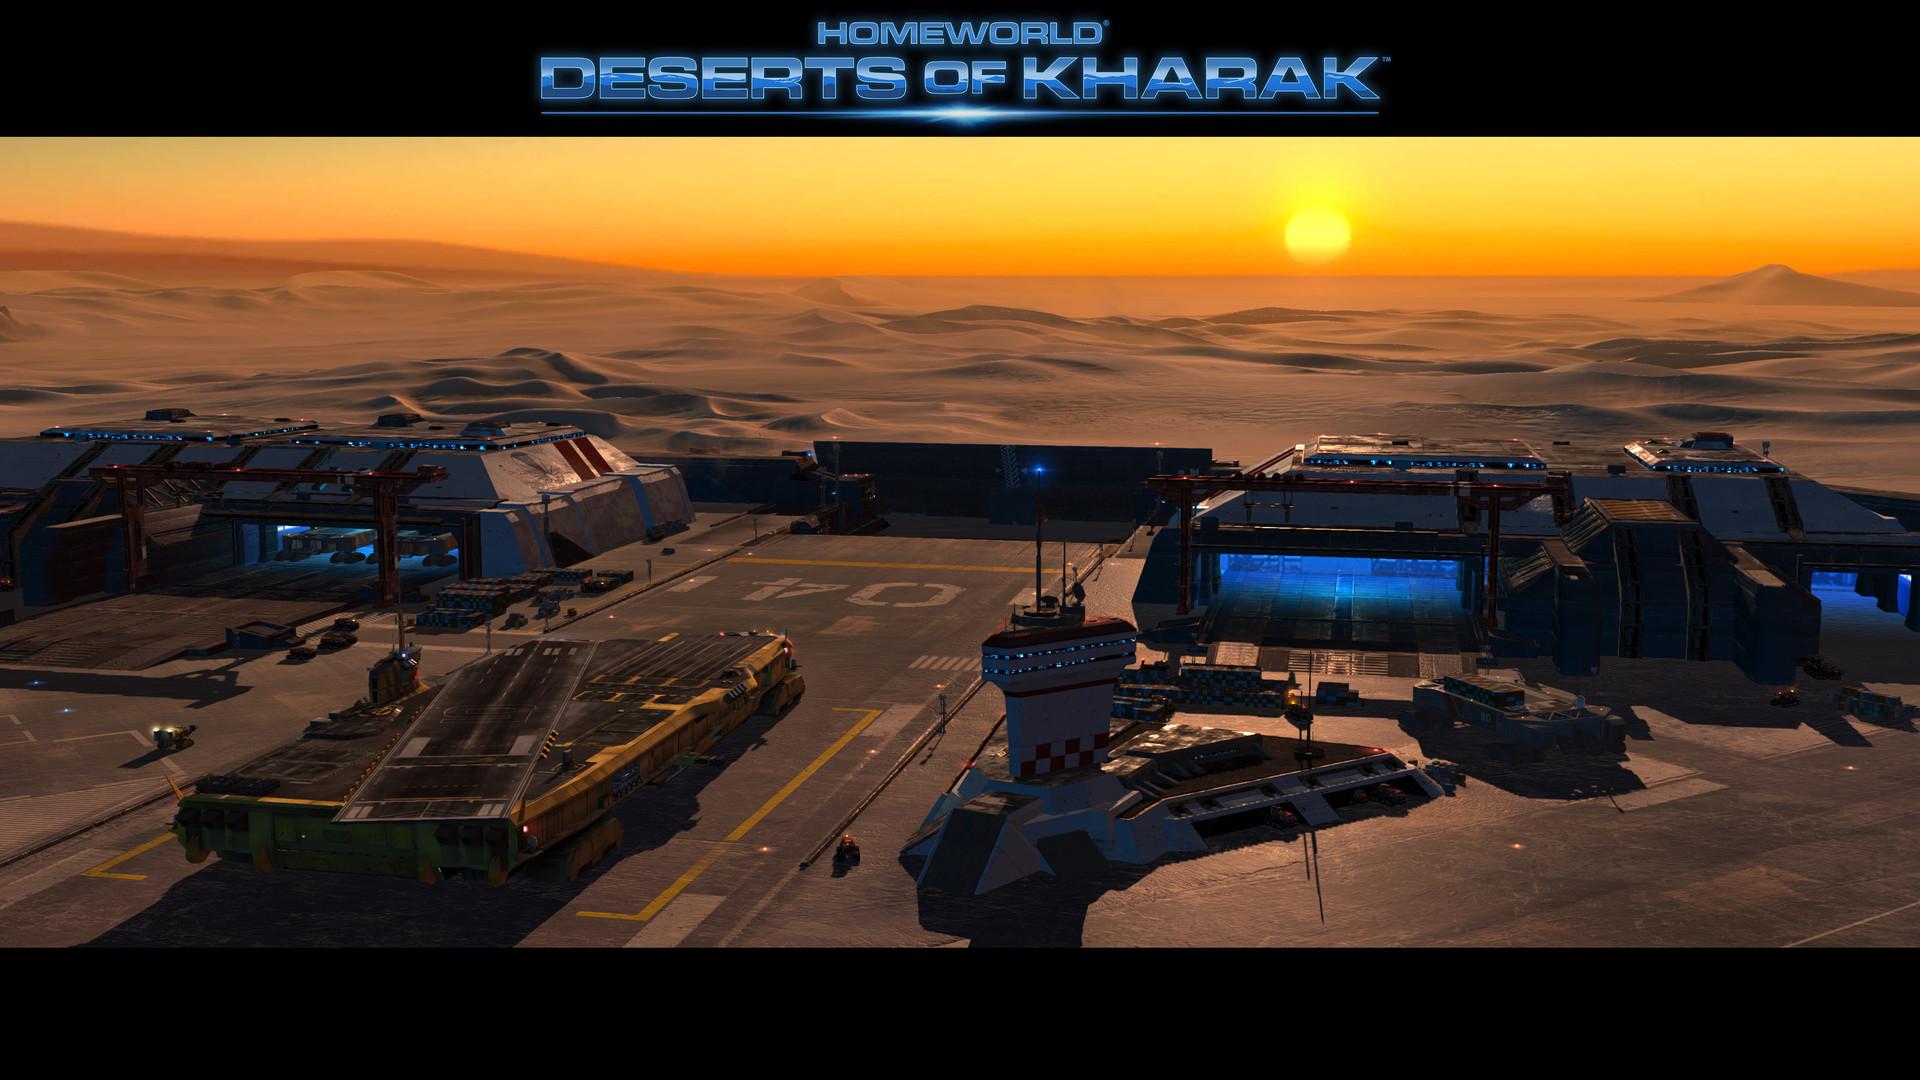 Interactive Wallpaper Iphone X Homeworld Deserts Of Kharak Full Hd Wallpaper And